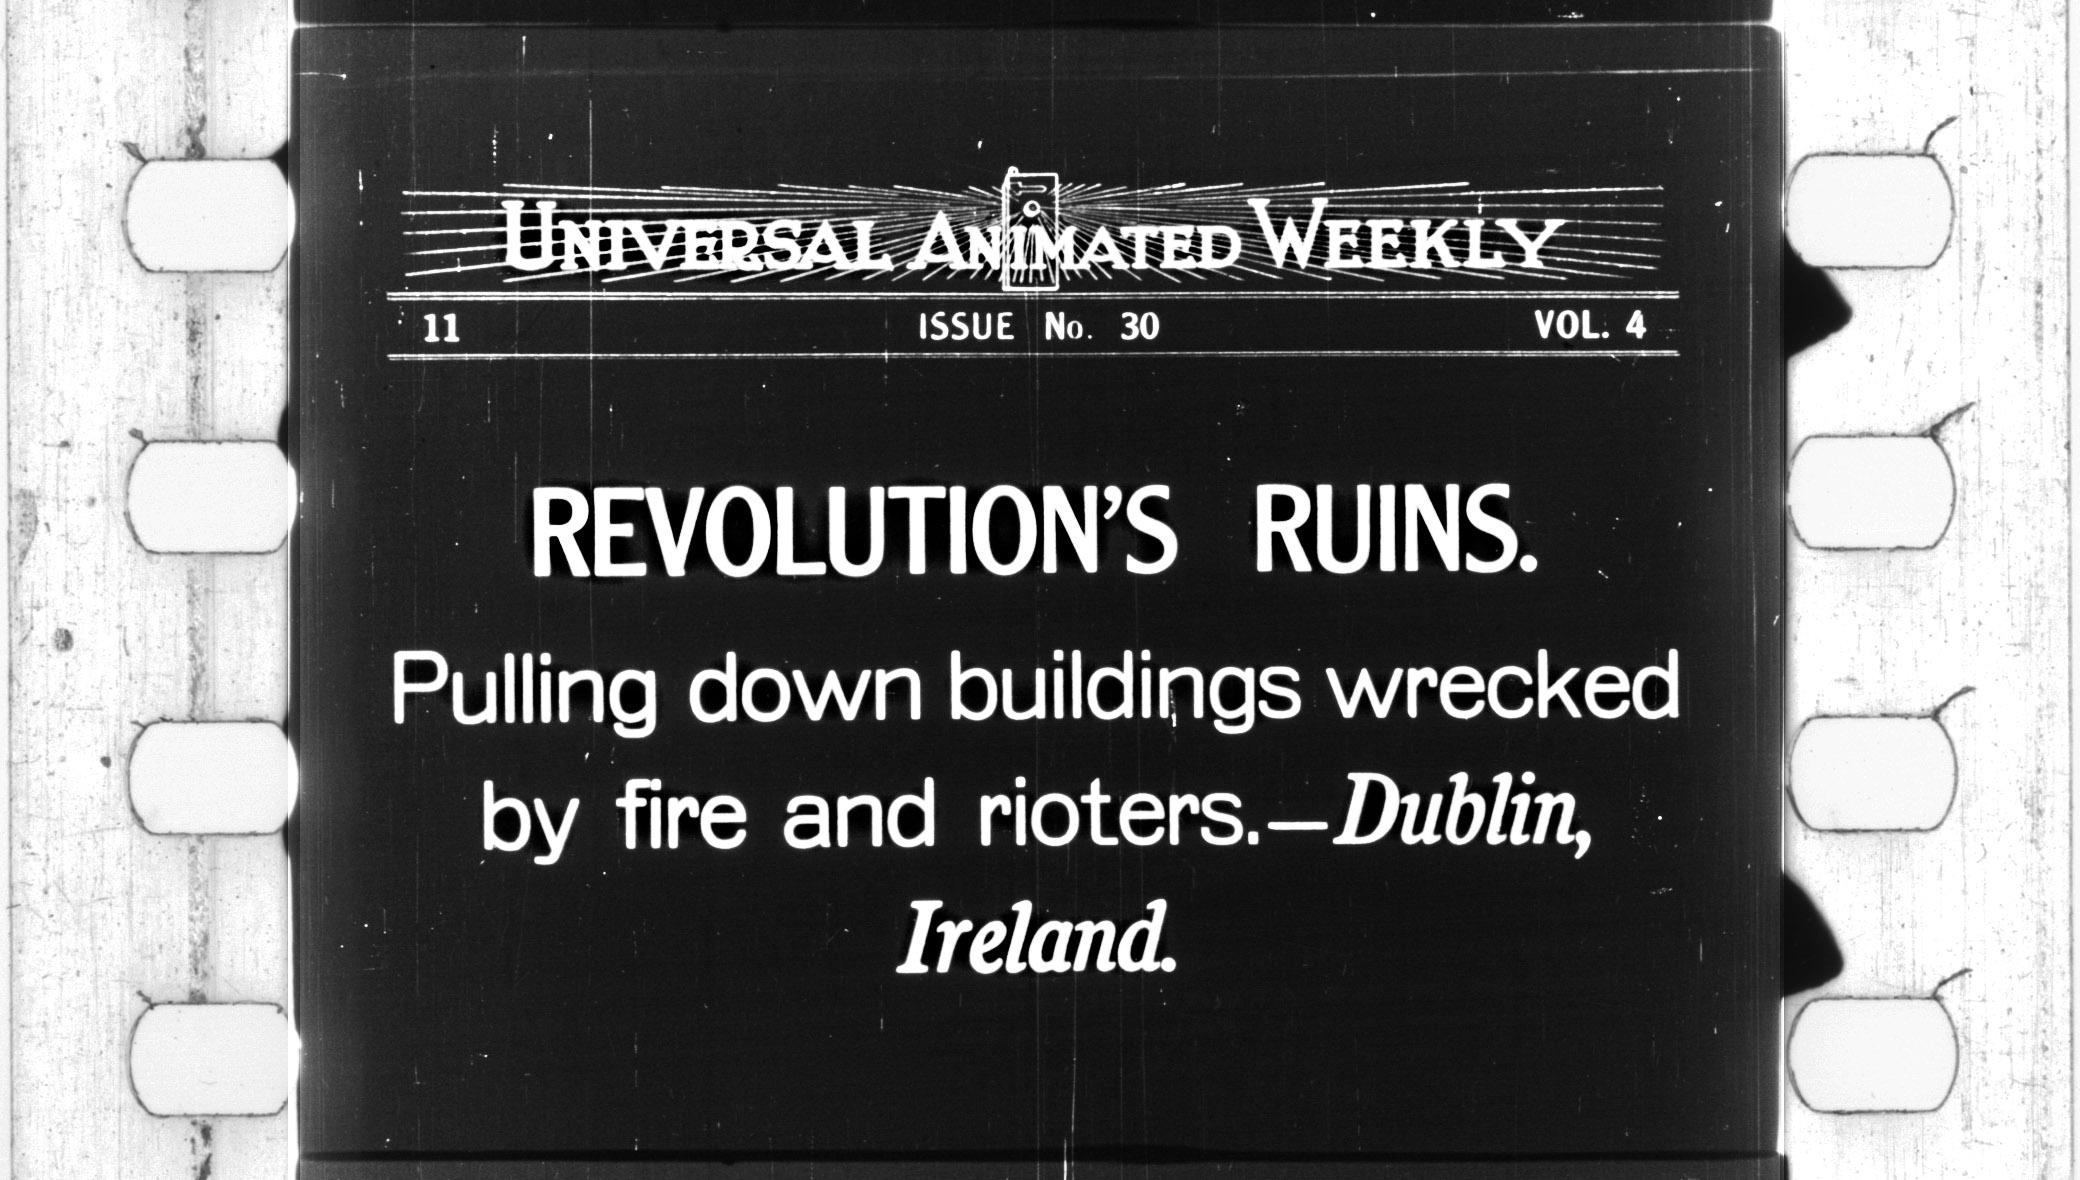 1916 animated weekly.jpg